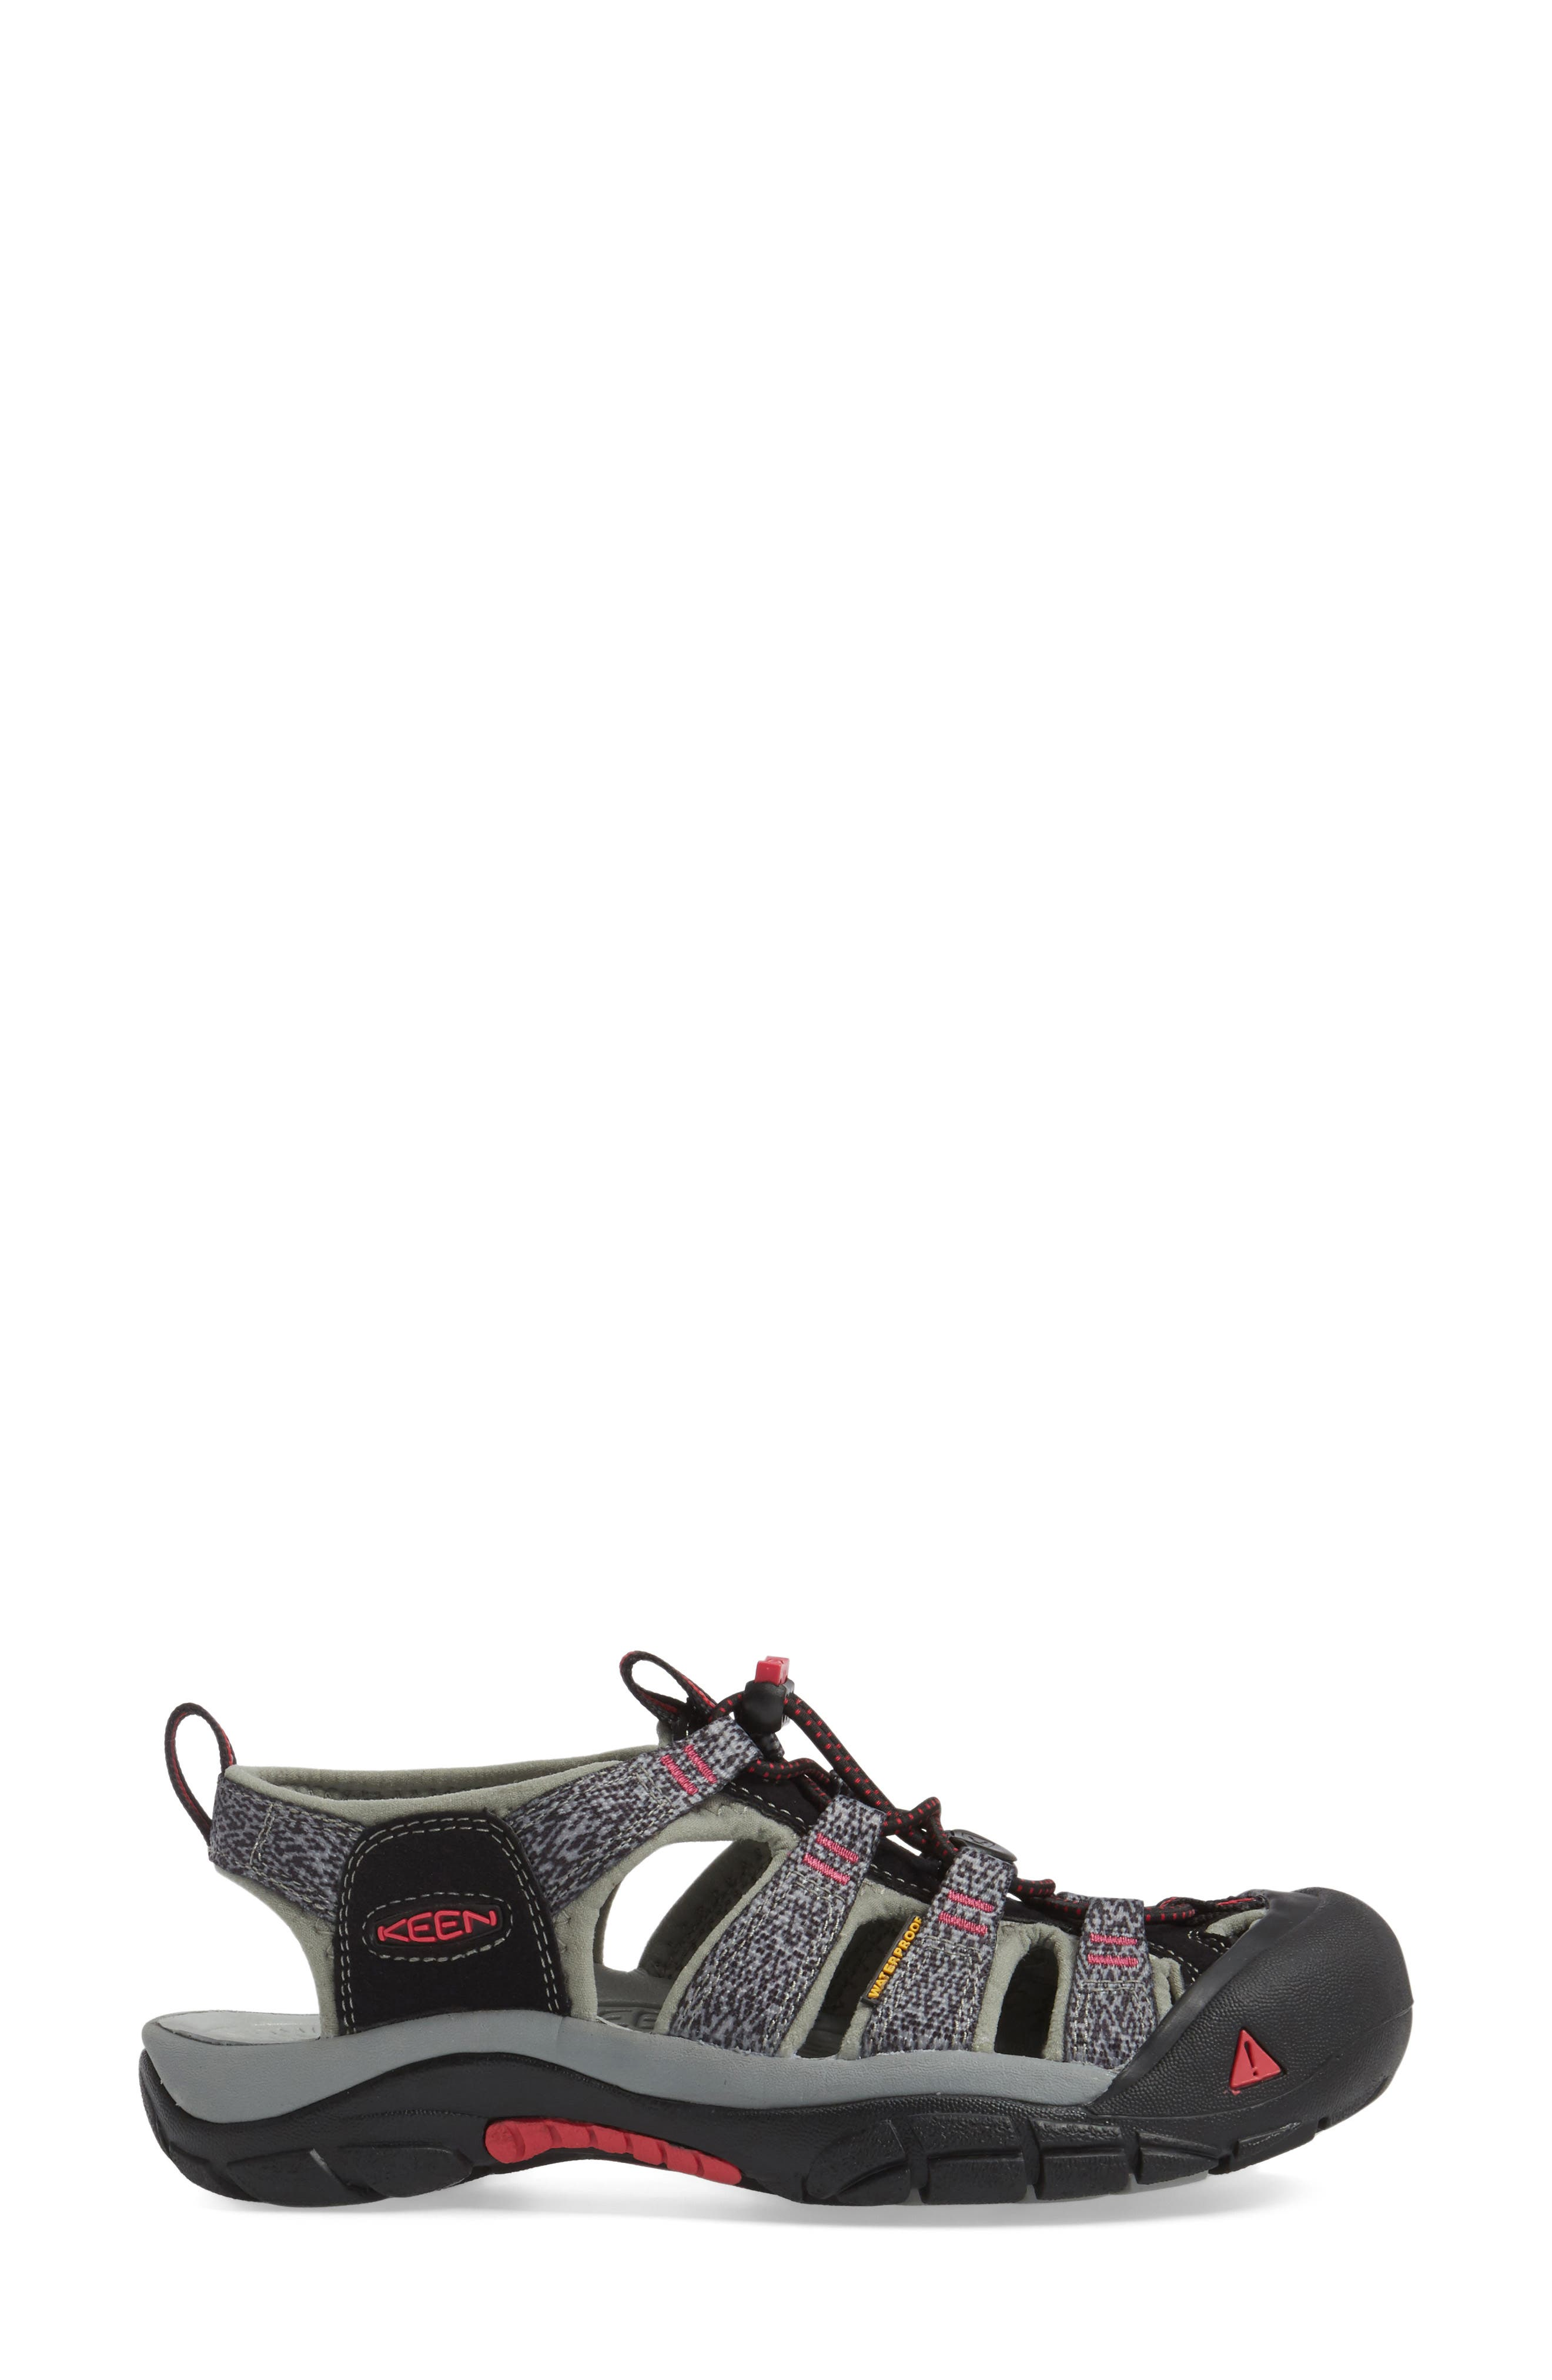 'Newport H2' Sandal,                             Alternate thumbnail 3, color,                             Black/ Bright Rose Fabric